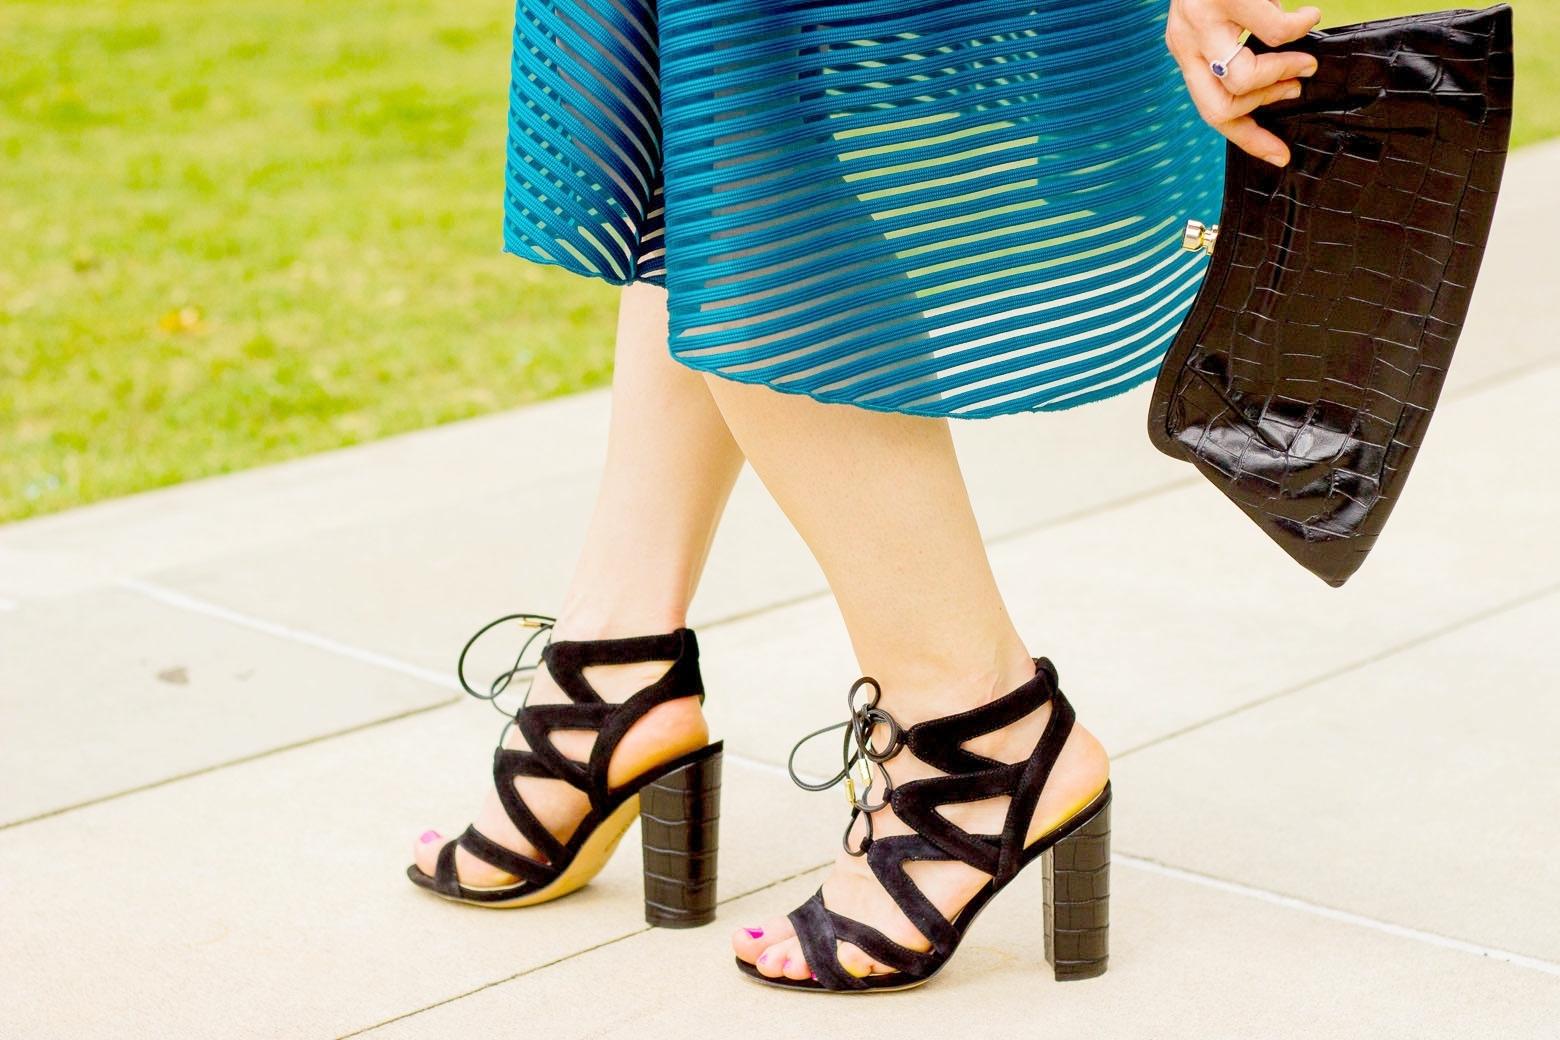 Sam Edelman Sandals on Belle Meets World blog